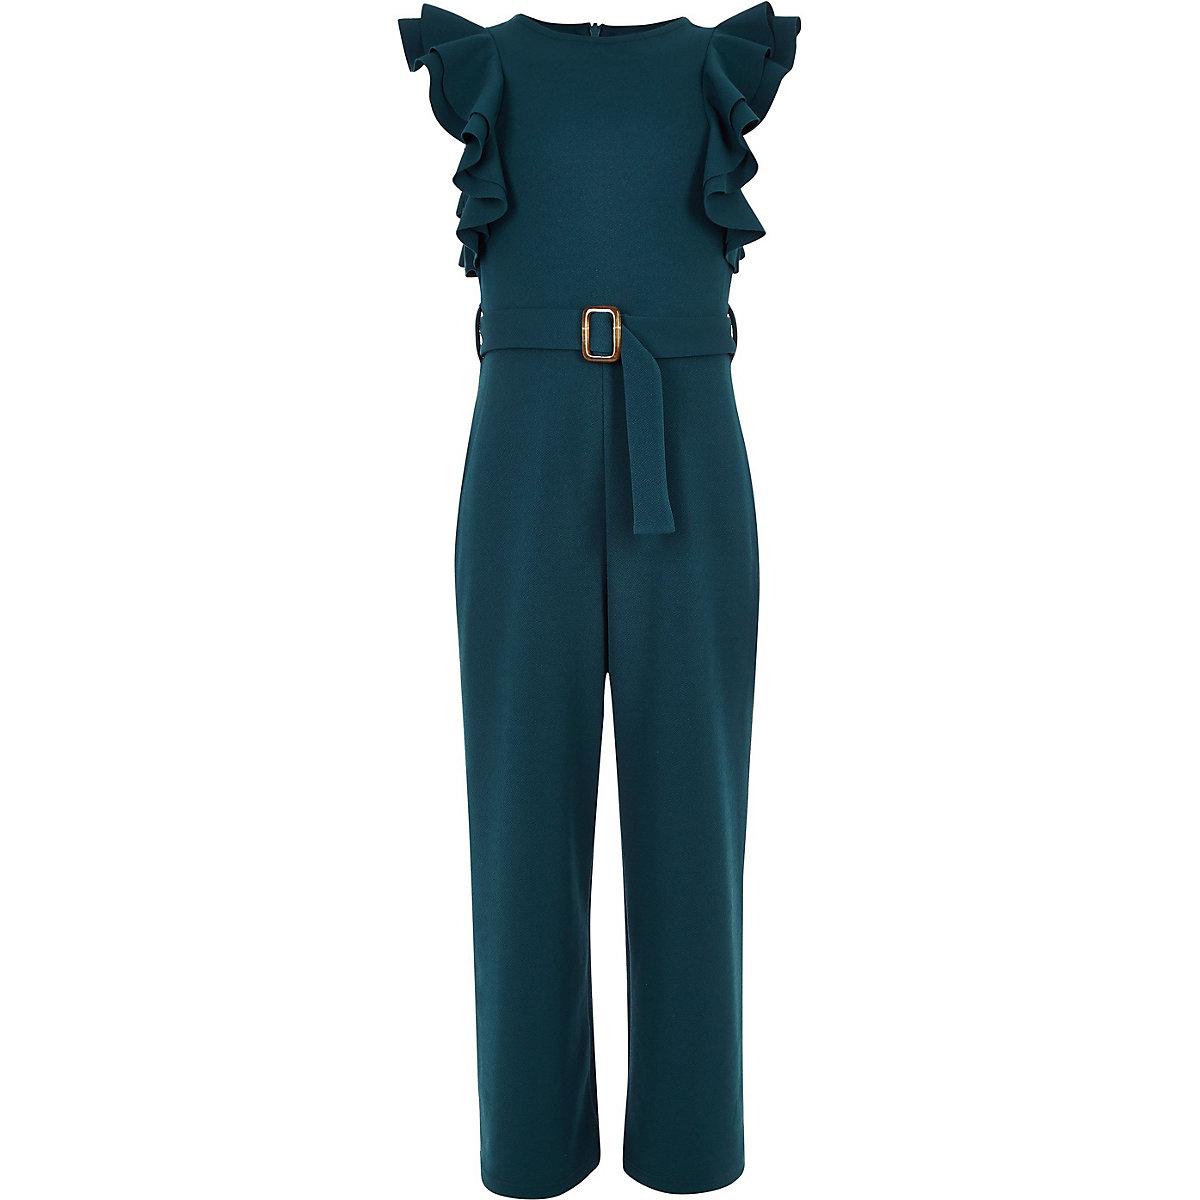 Girls dark blue ruffle belted jumpsuit